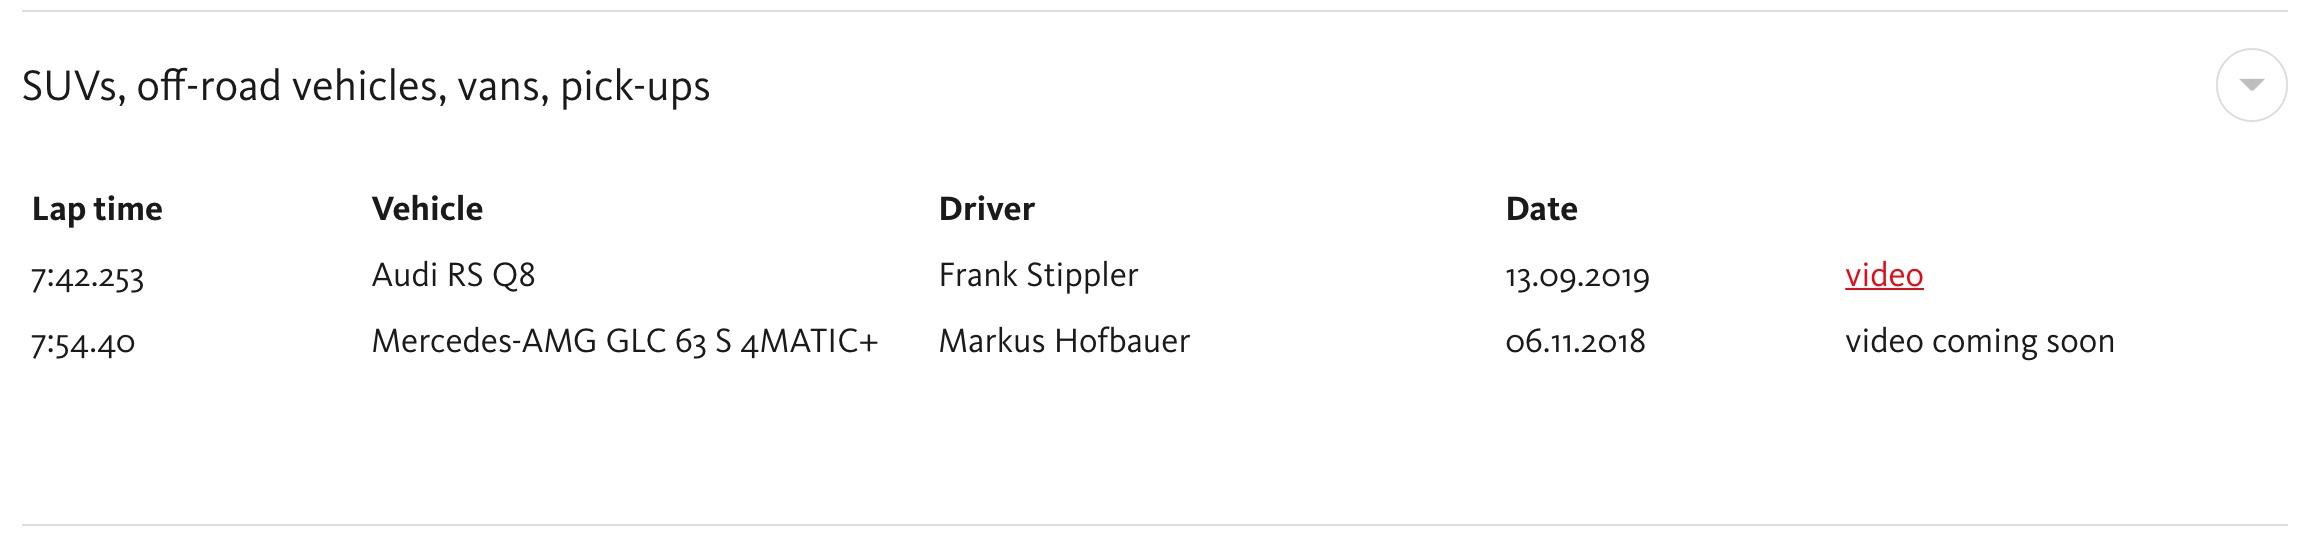 Nürburgring SUV lap records